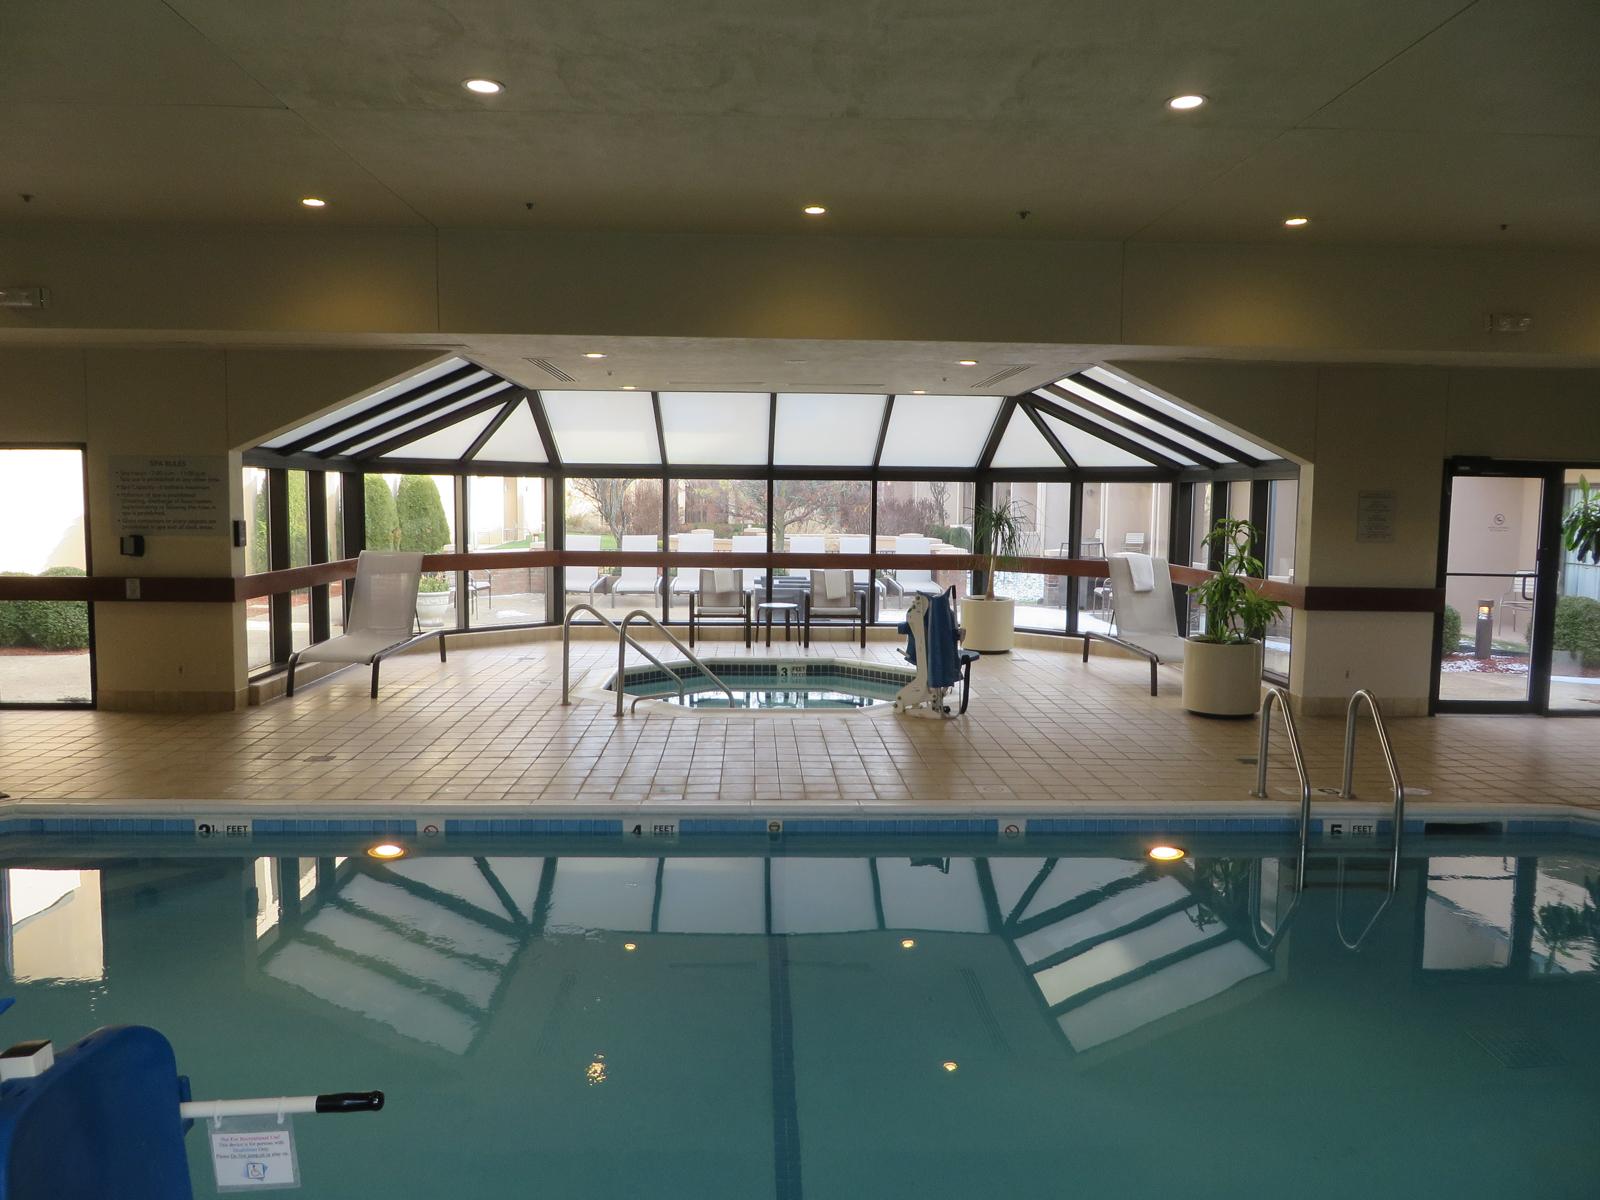 marriott-fitness-center-existing.jpg